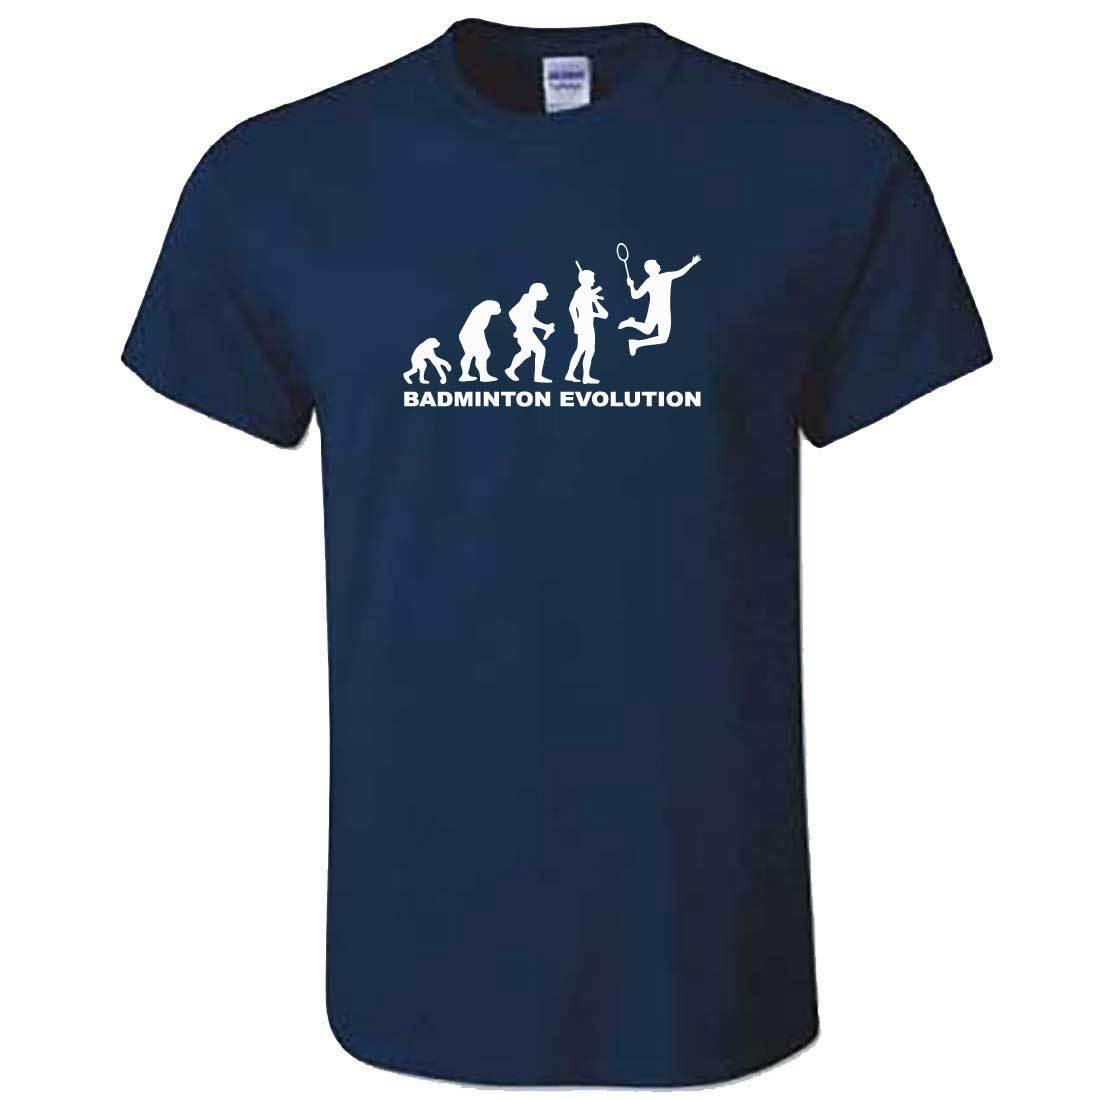 2019 Fashion Hot Sale 100% Cotton Unisex Evolution Of BADMINTONS Tshirt - Funny Badmington Racket Shuttlecock Top Tee Shirt